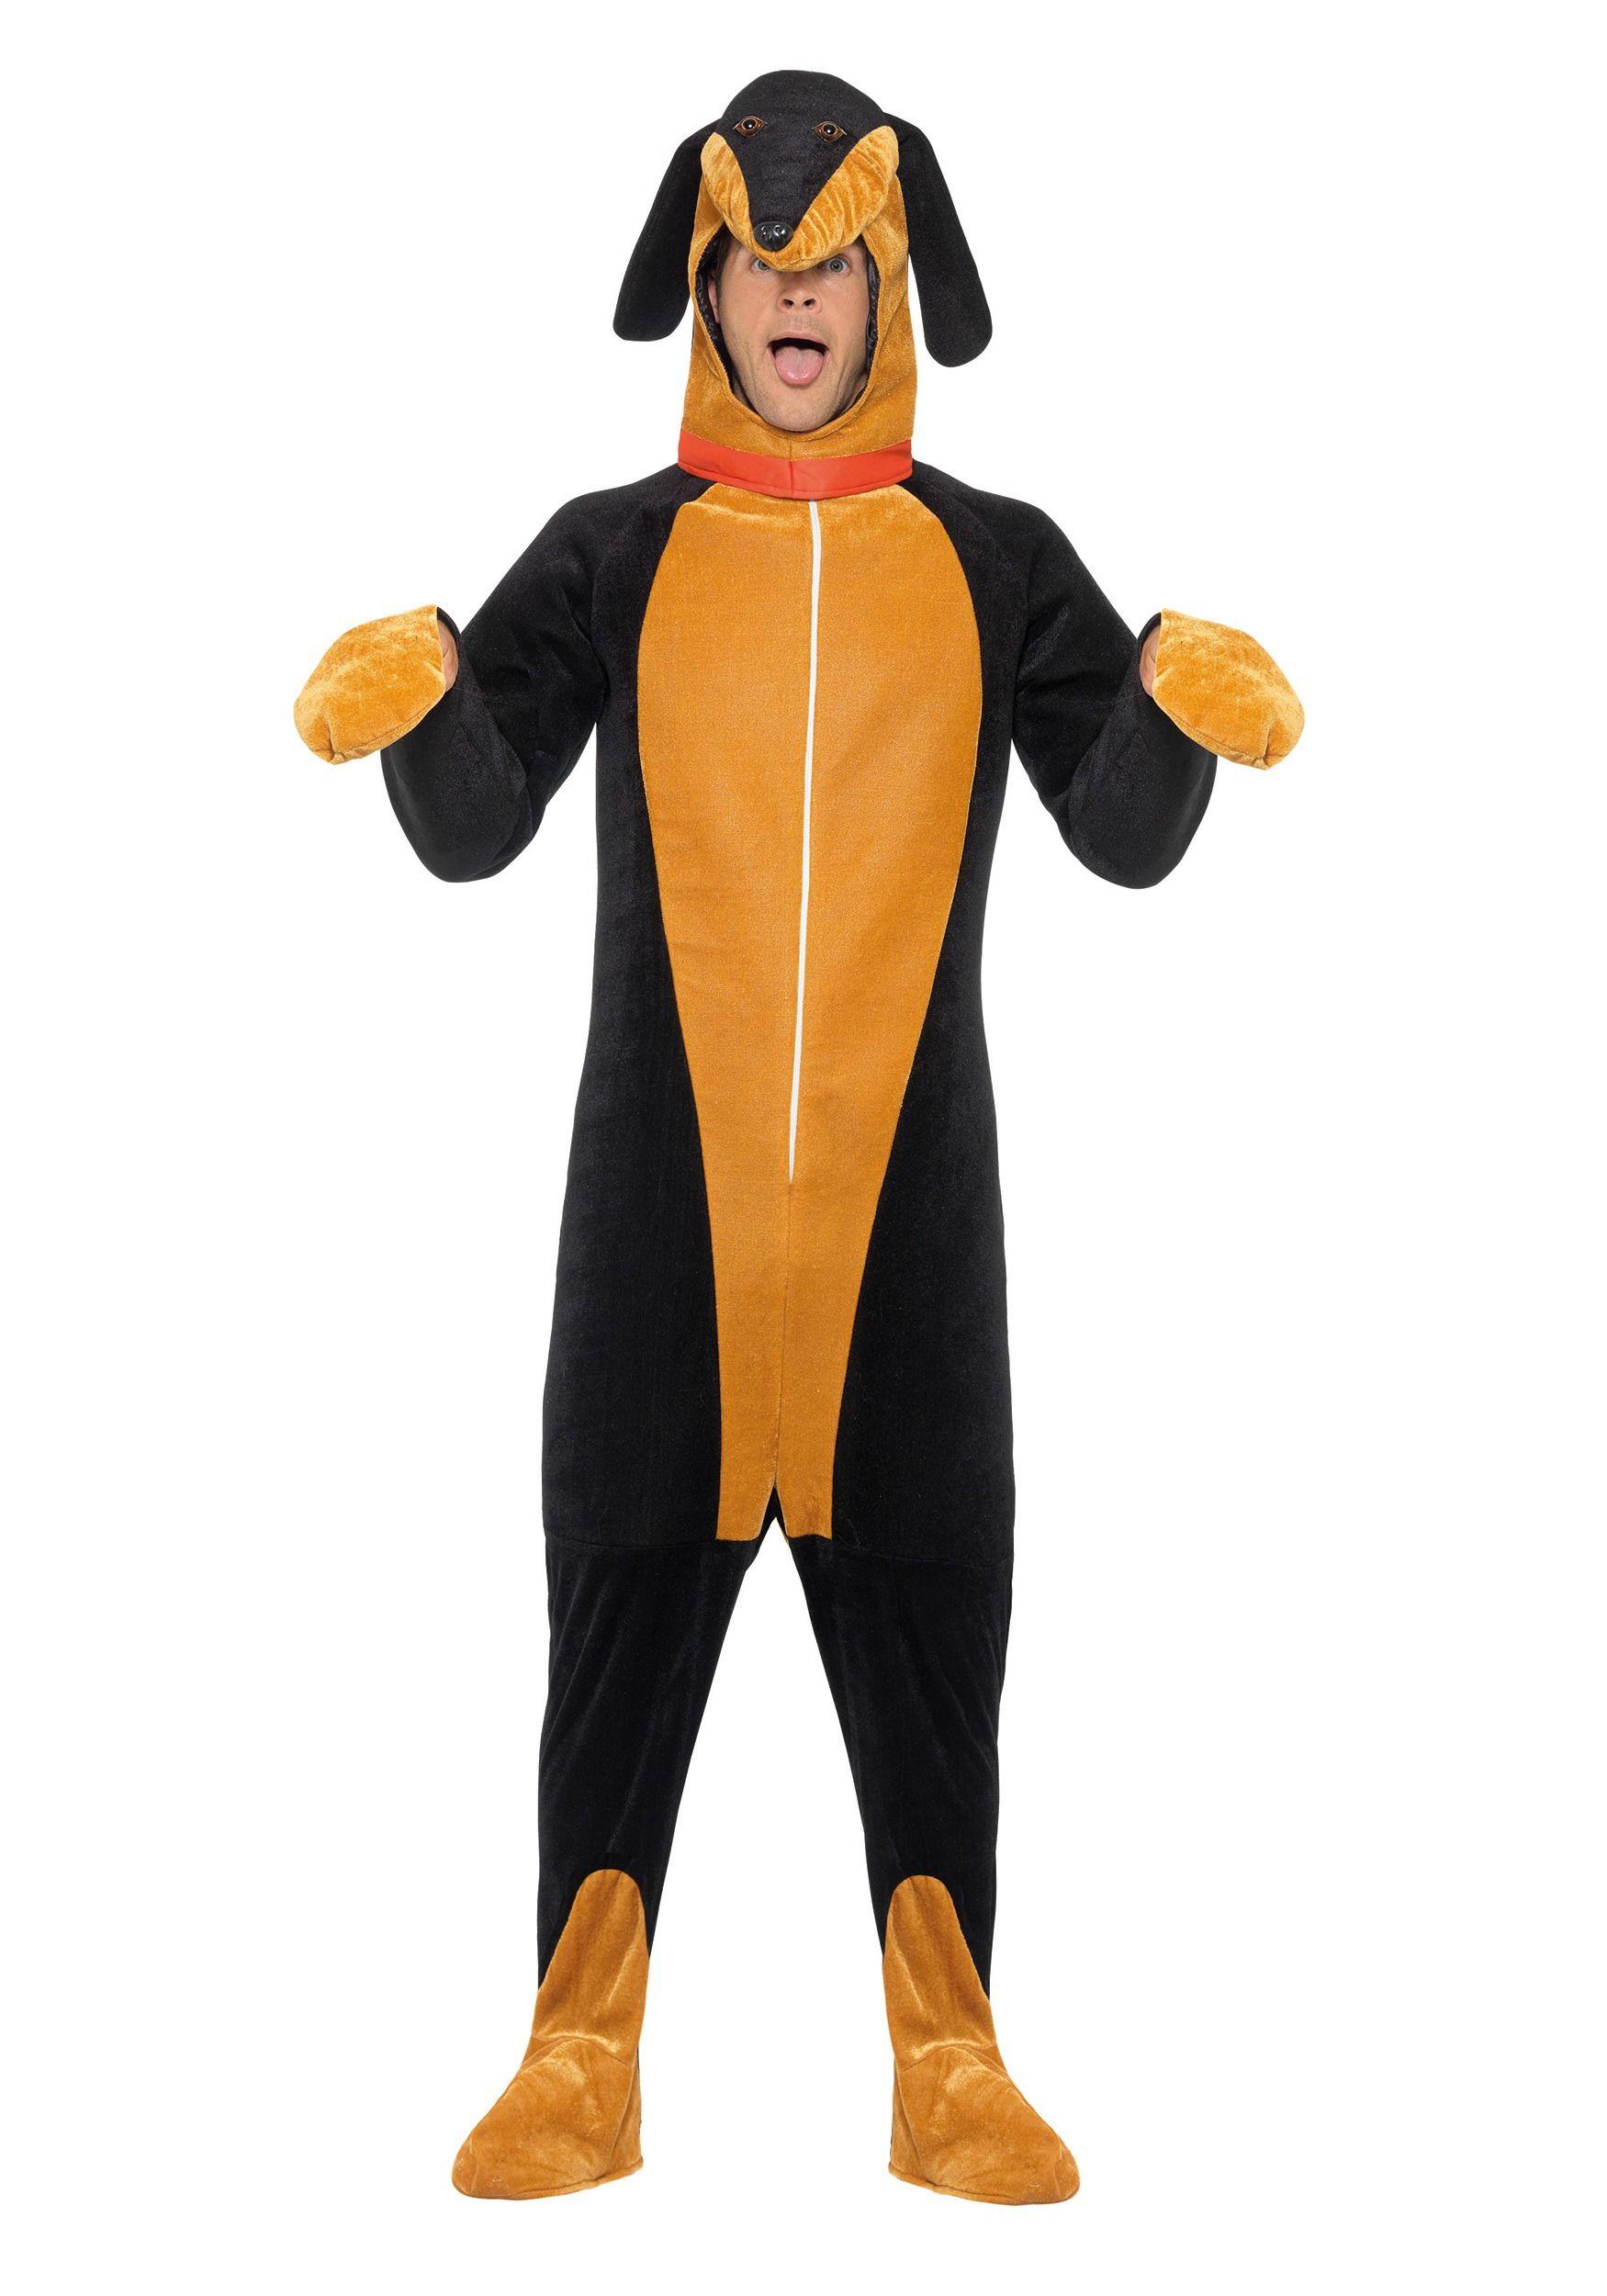 Adult Dachshund Costume Dachshund Costume Dog Costumes For Kids